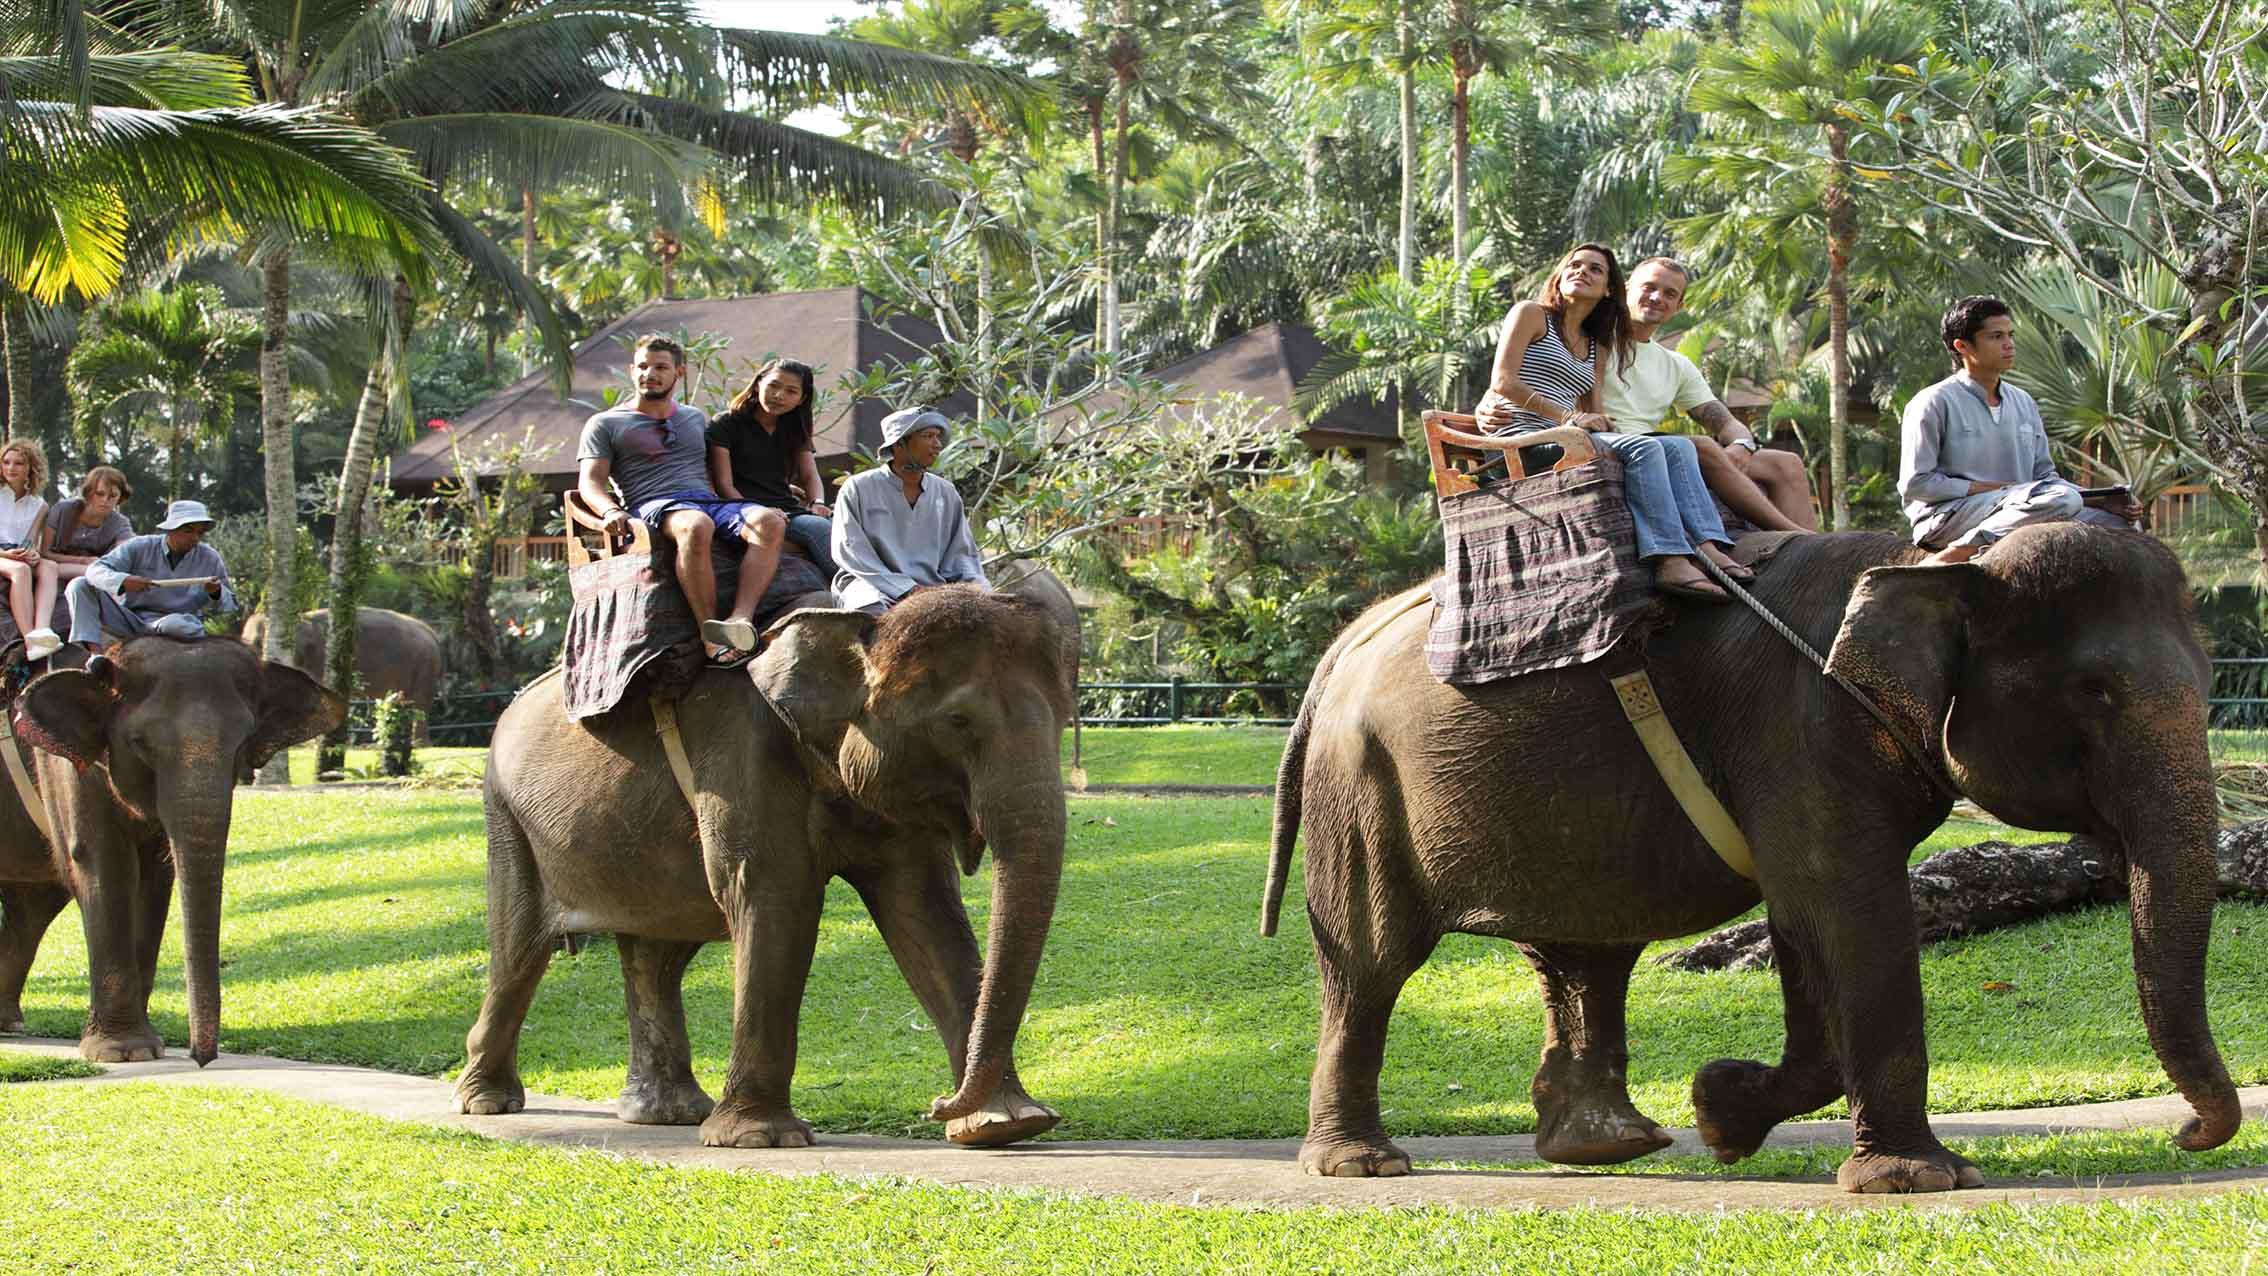 Bali Adventure Tours Elephant Safari Park